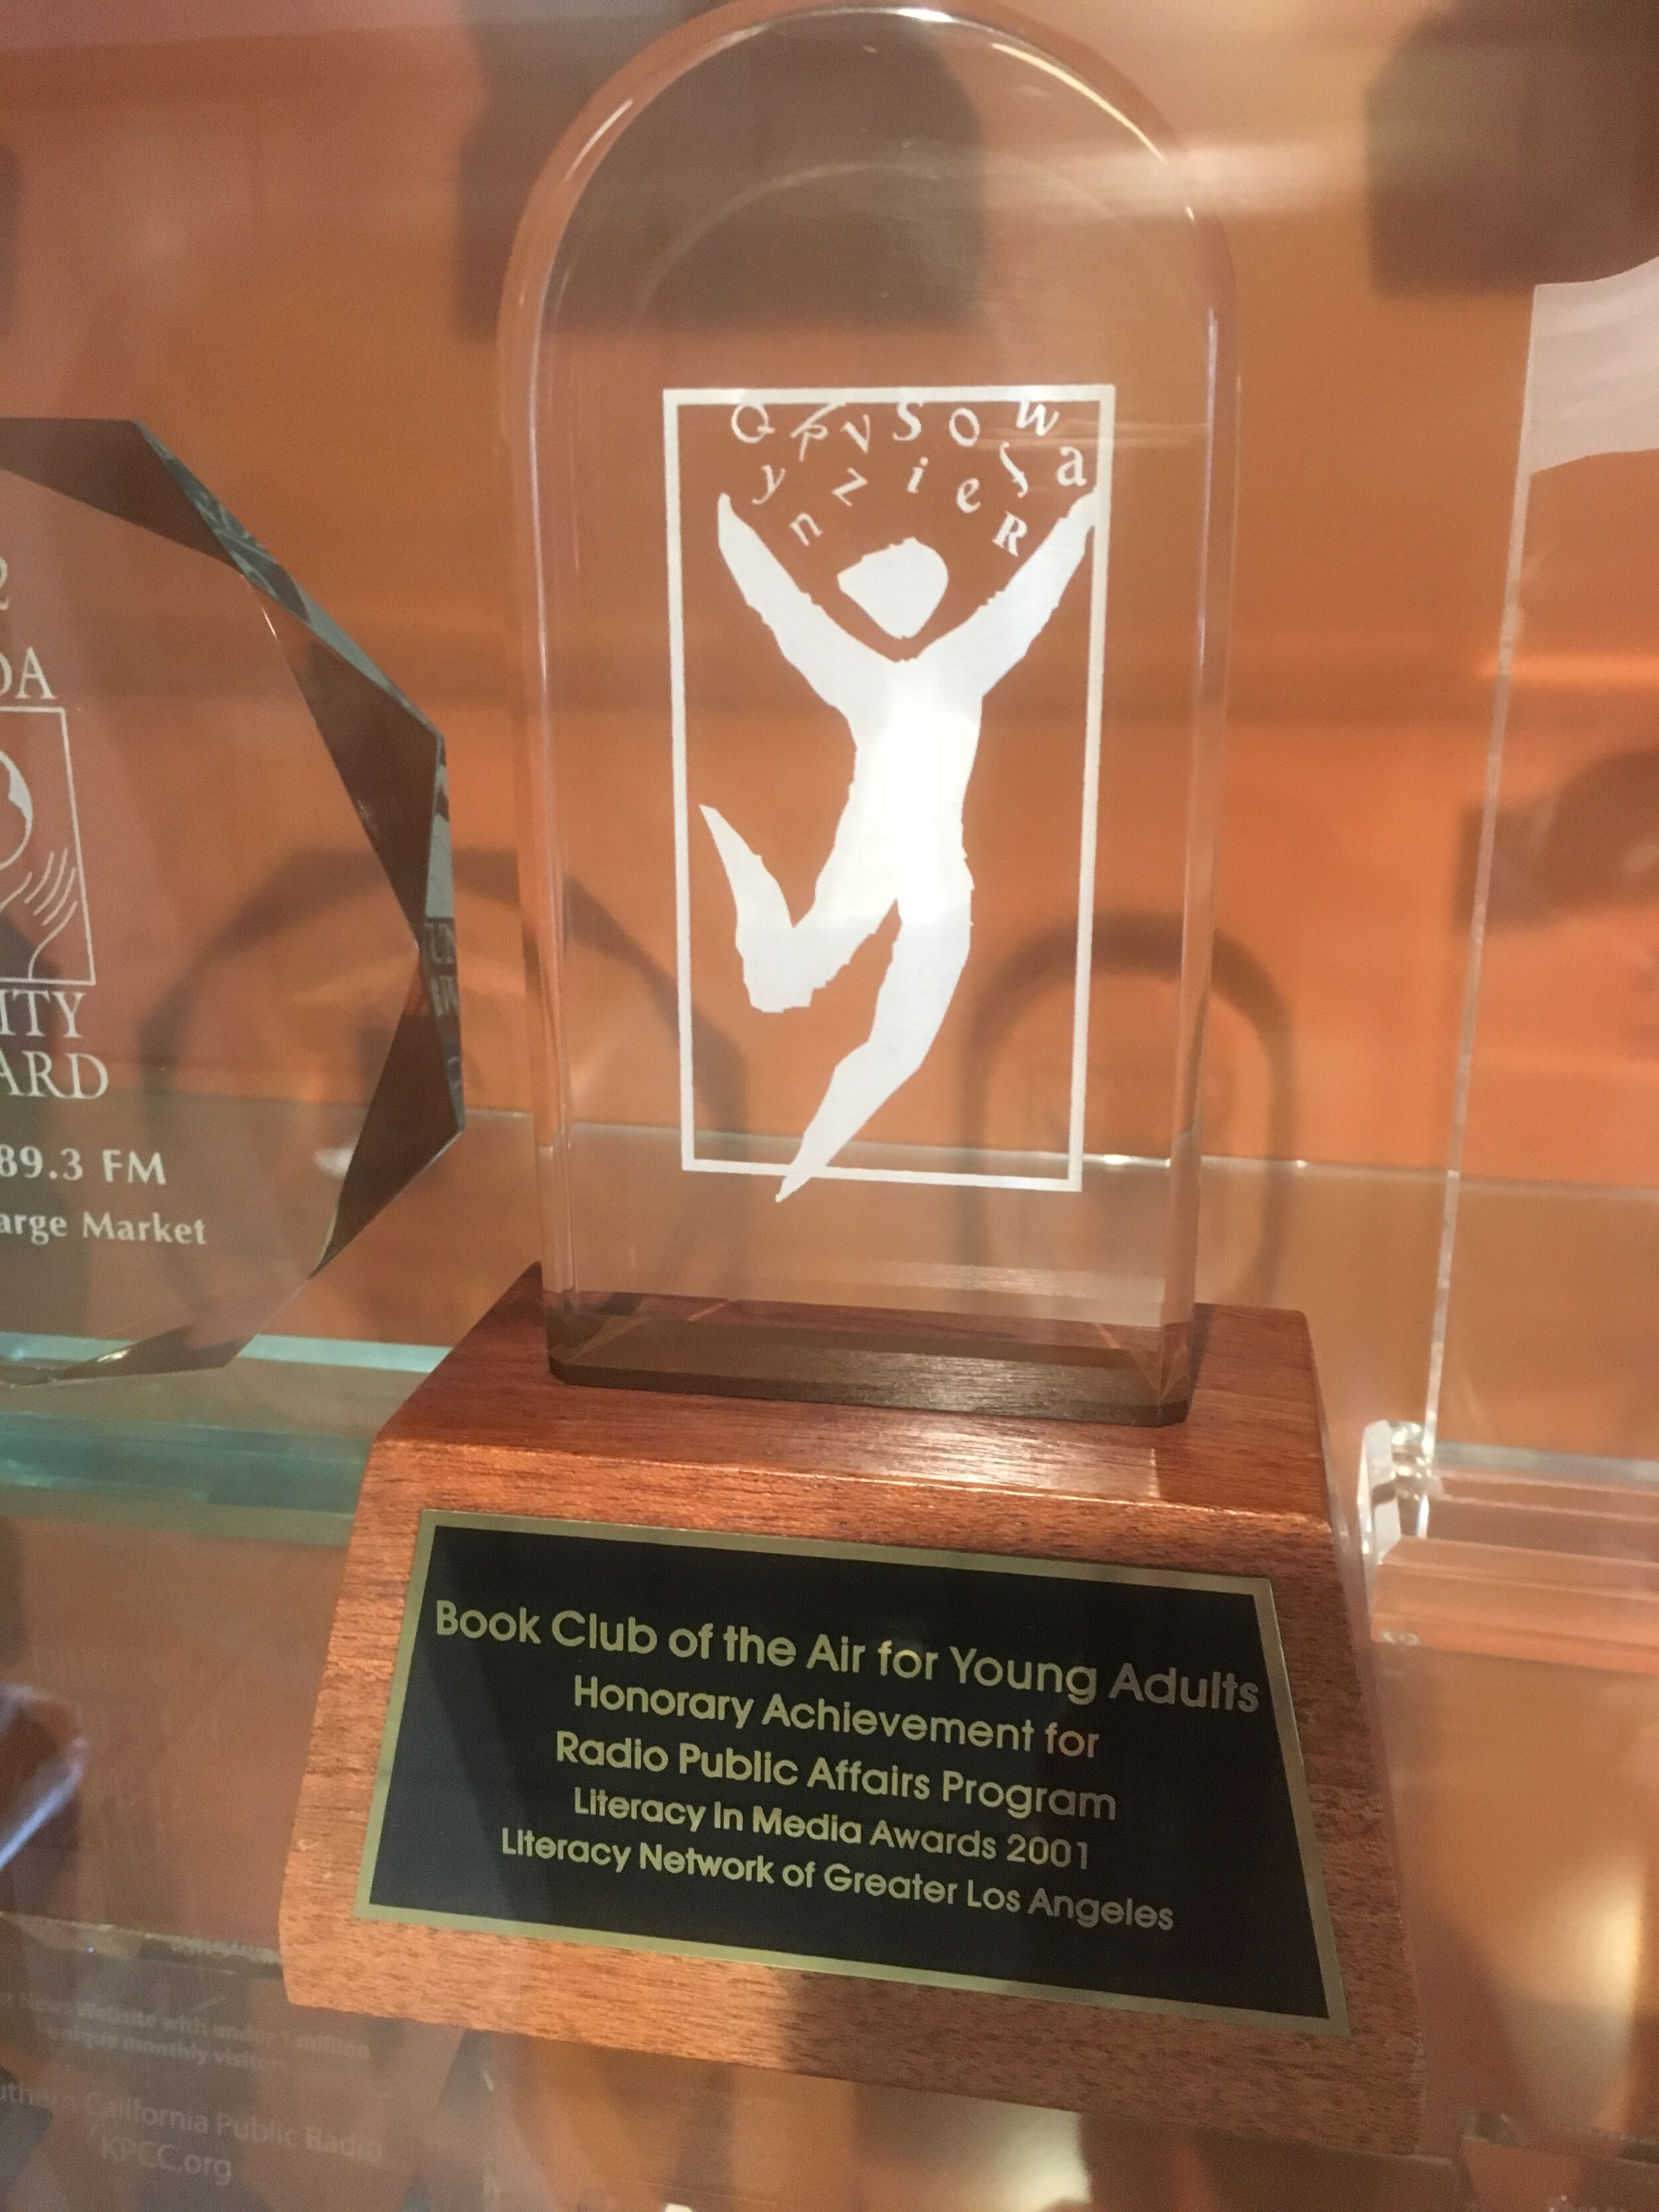 Literacy in Media Award - Literacy Network of Greater Los Angeles